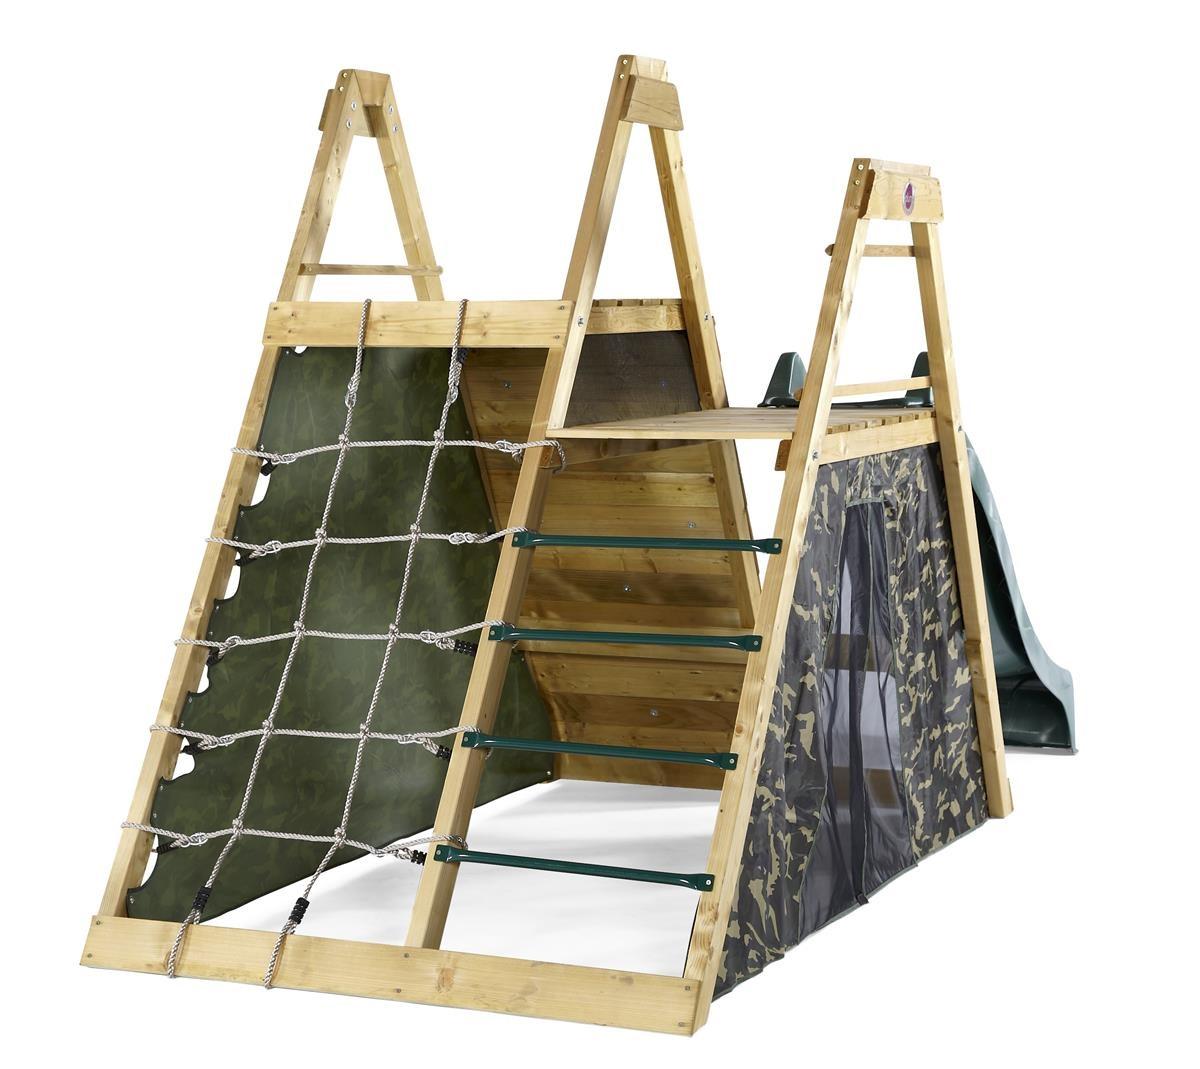 Klettergerüst Pyramide : Kletterpyramide klettergerüst spielturm kletterturm pyramide